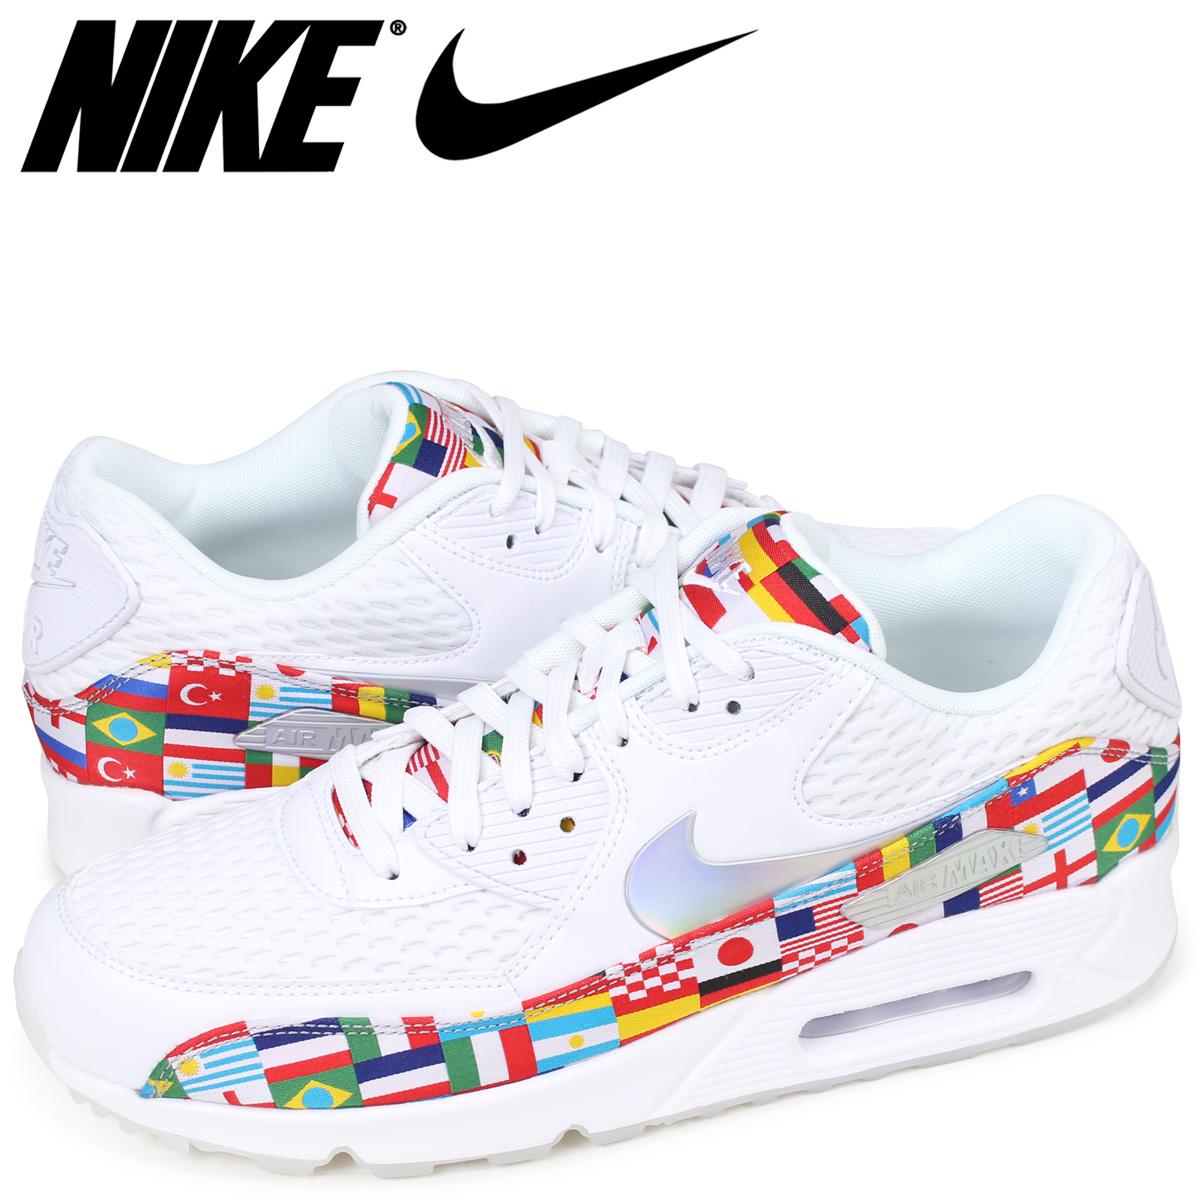 pretty nice 5aa3f a400c NIKE AIR MAX 90 NIC QS Kie Ney AMAX 90 sneakers men white AO5119-100